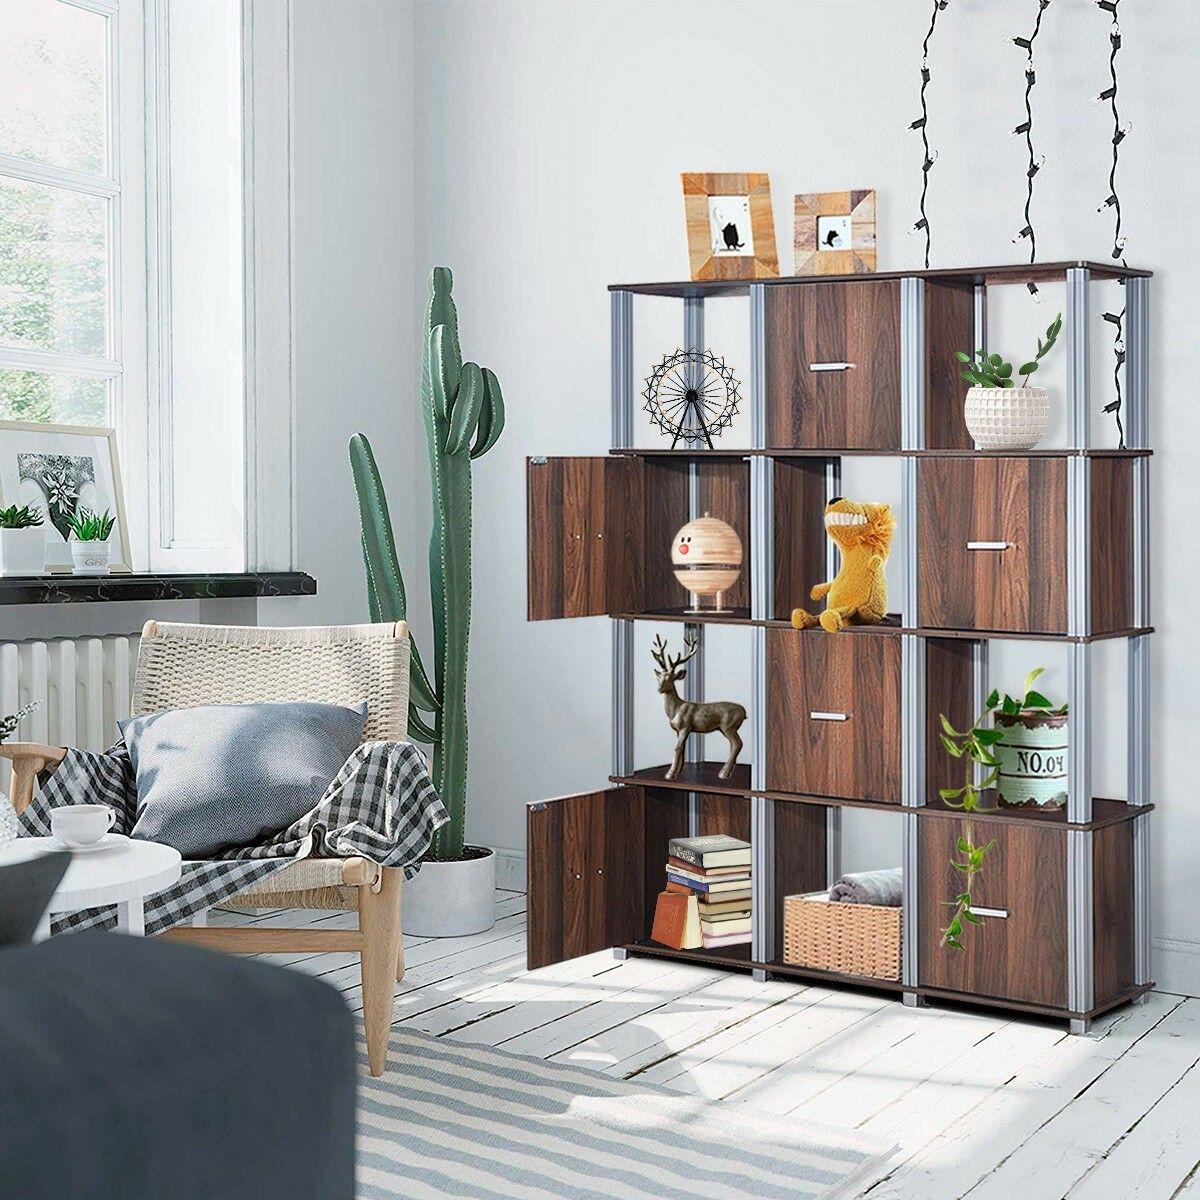 4 Tier Storage Shelf Display Bookcase With 6 Doors Display Bookcase Storage Shelves Shelves #storage #shelf #for #living #room